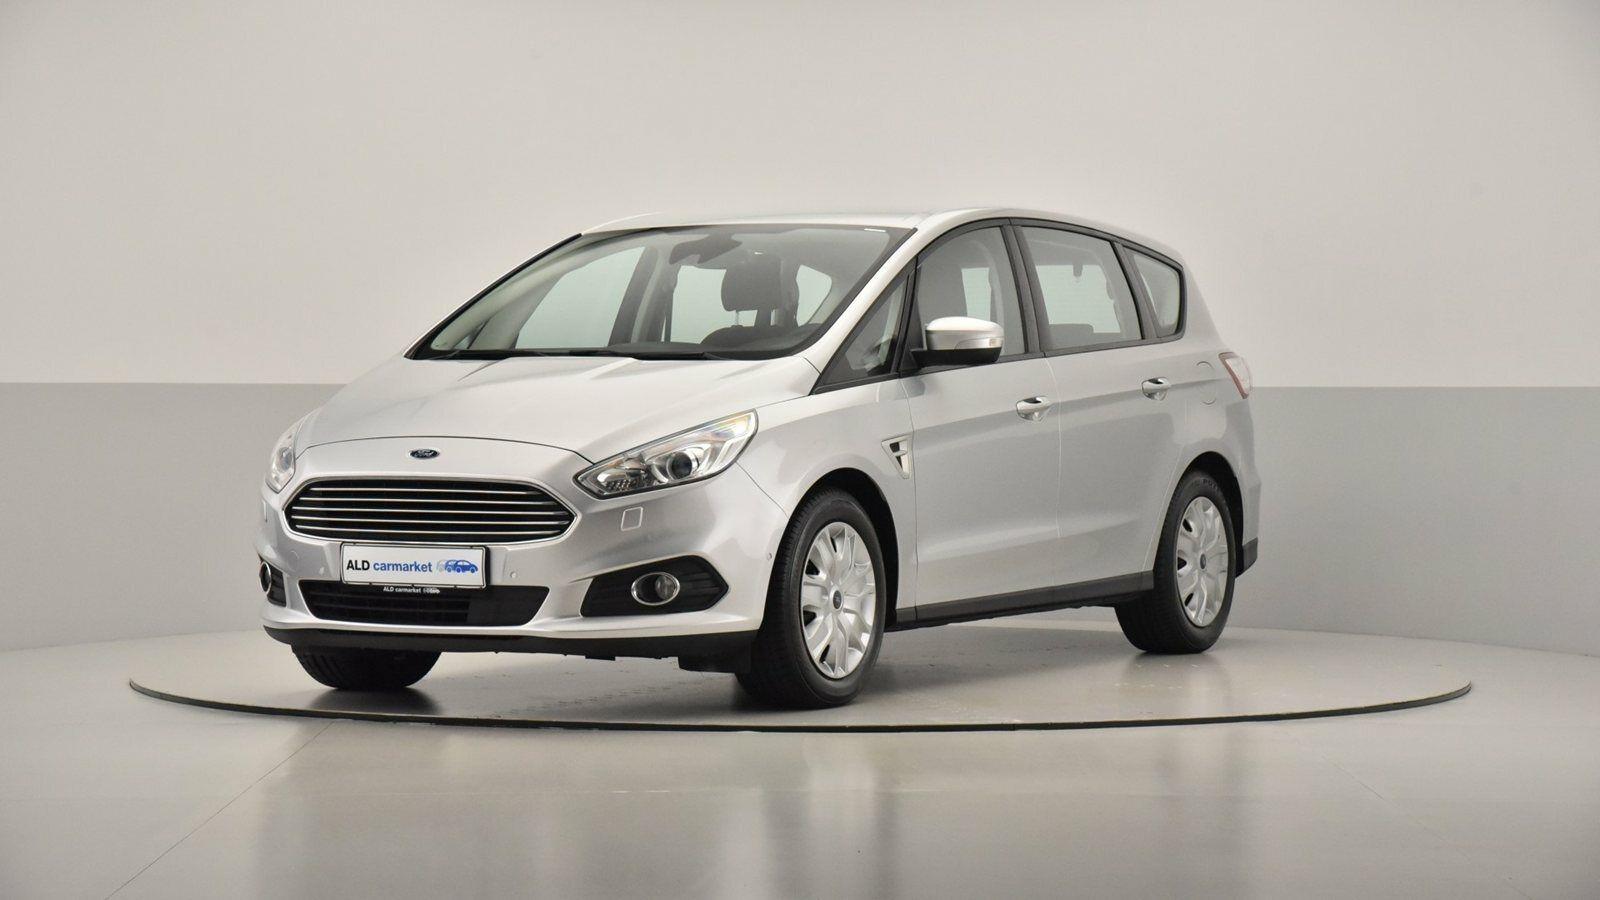 Ford S-MAX 2,0 TDCi 150 Trend 7prs 5d - 247.000 kr.